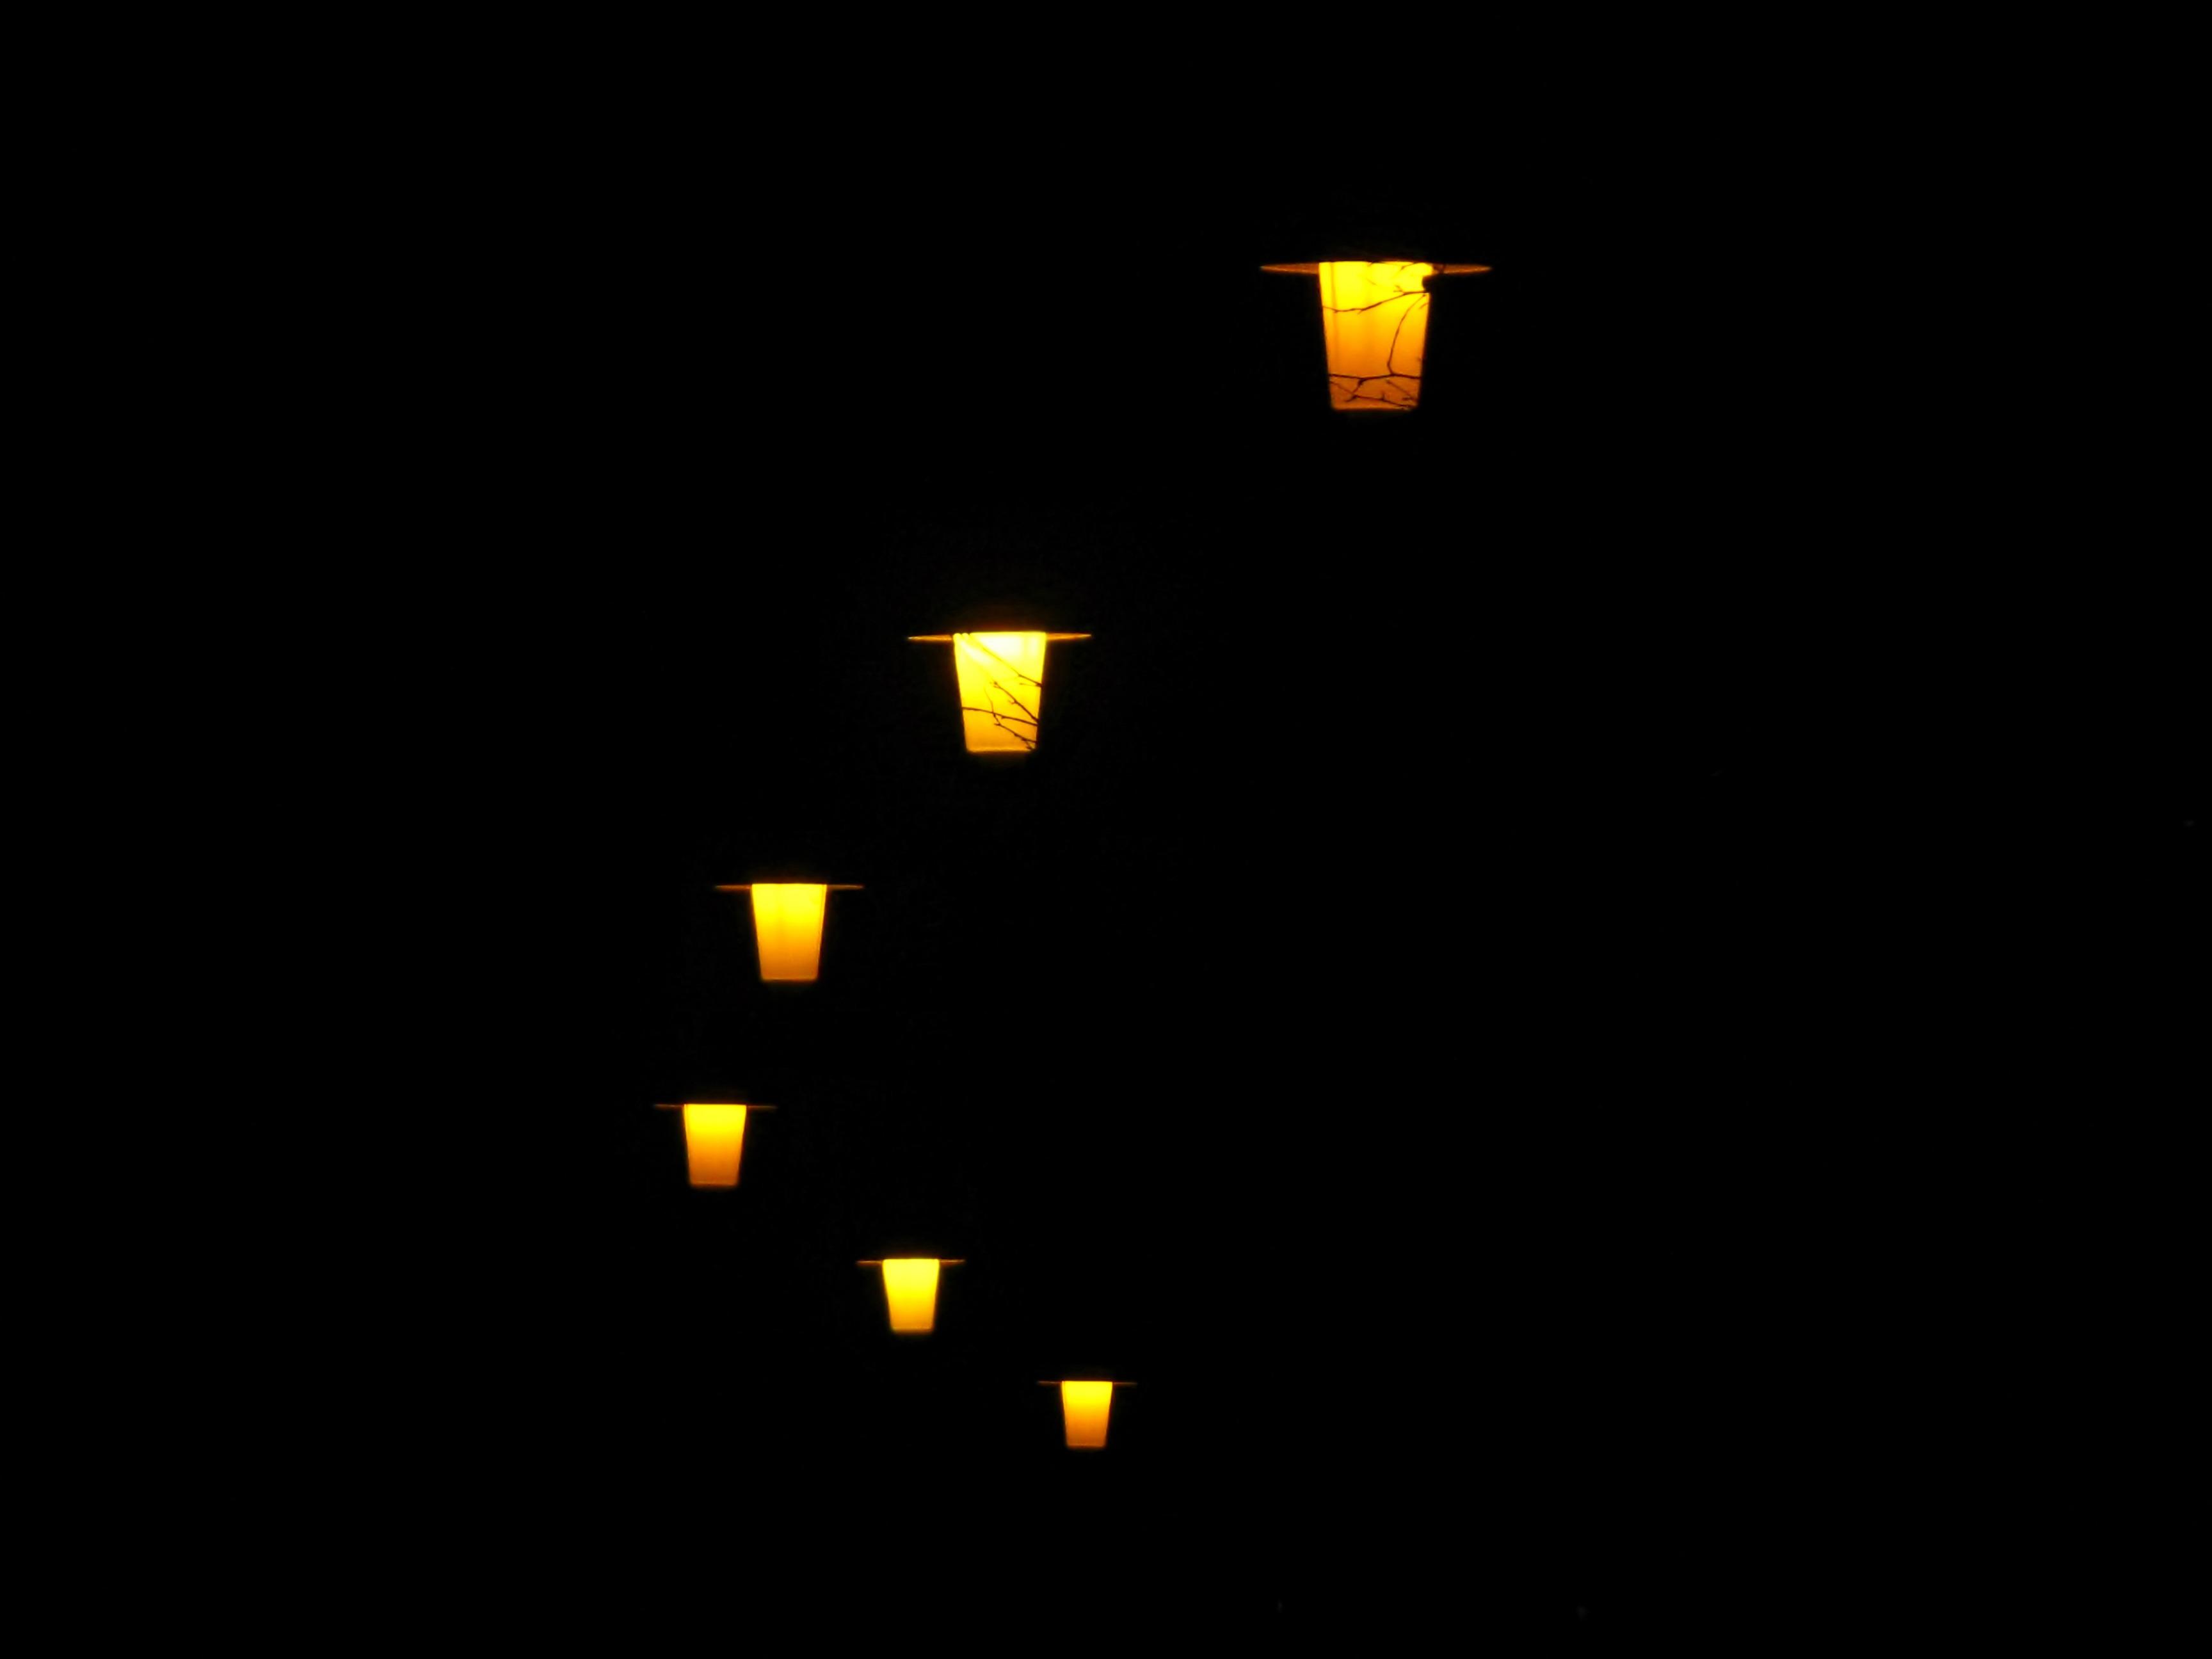 Best Wallpaper Night Lantern - silhouette-light-night-number-line-color-darkness-lighting-street-lamp-font-lanterns-shape-screenshot-computer-wallpaper-986697  Best Photo Reference-737740.jpg